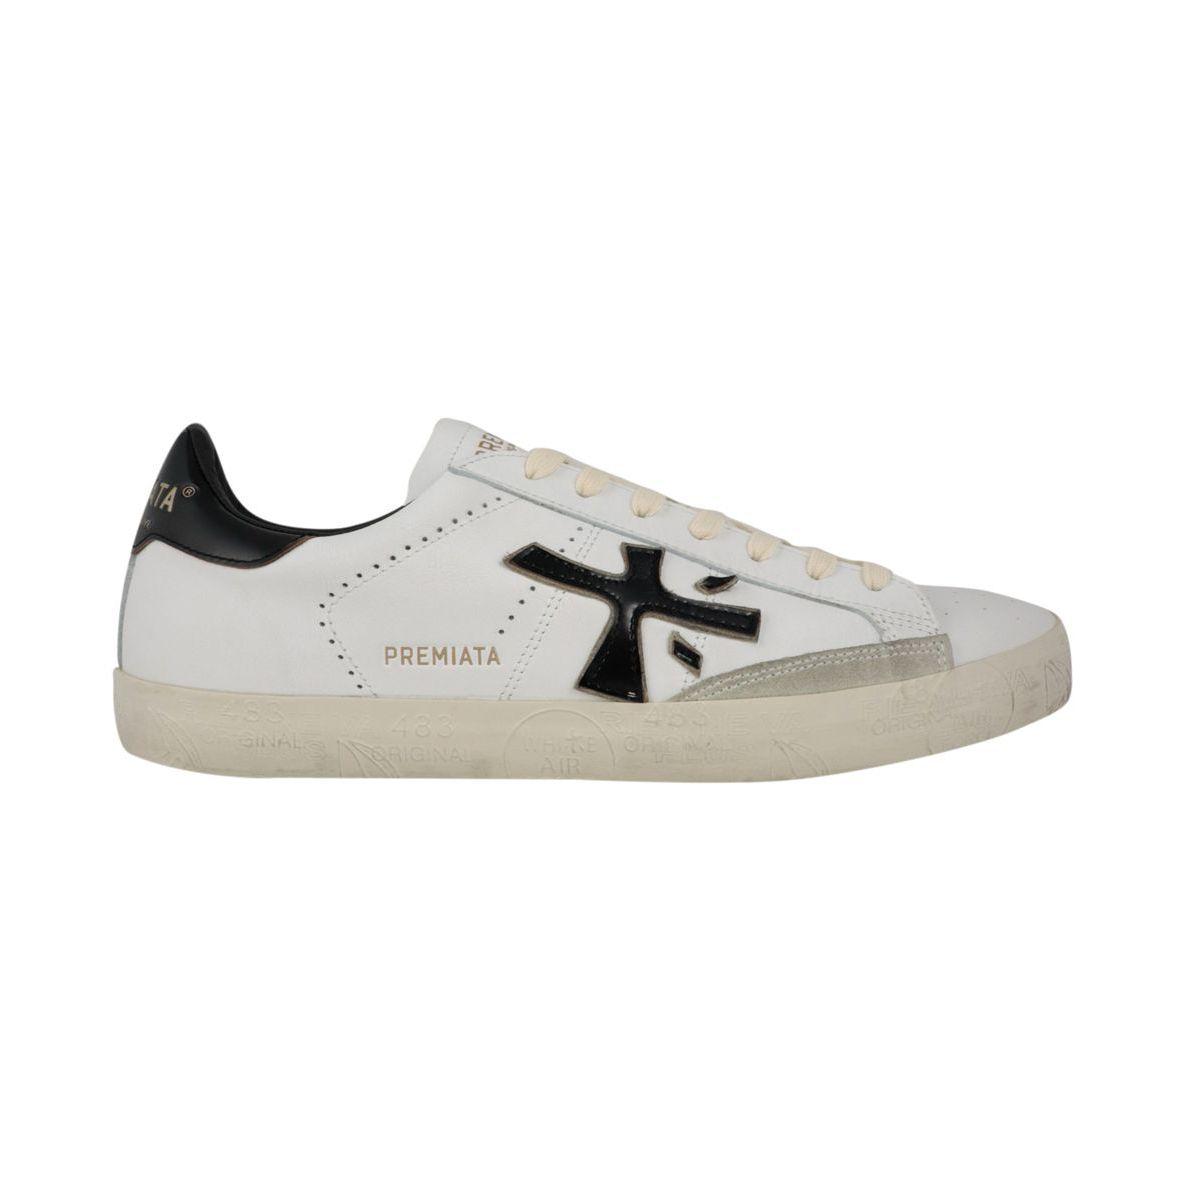 Steven sneakers in printed leather White black Premiata